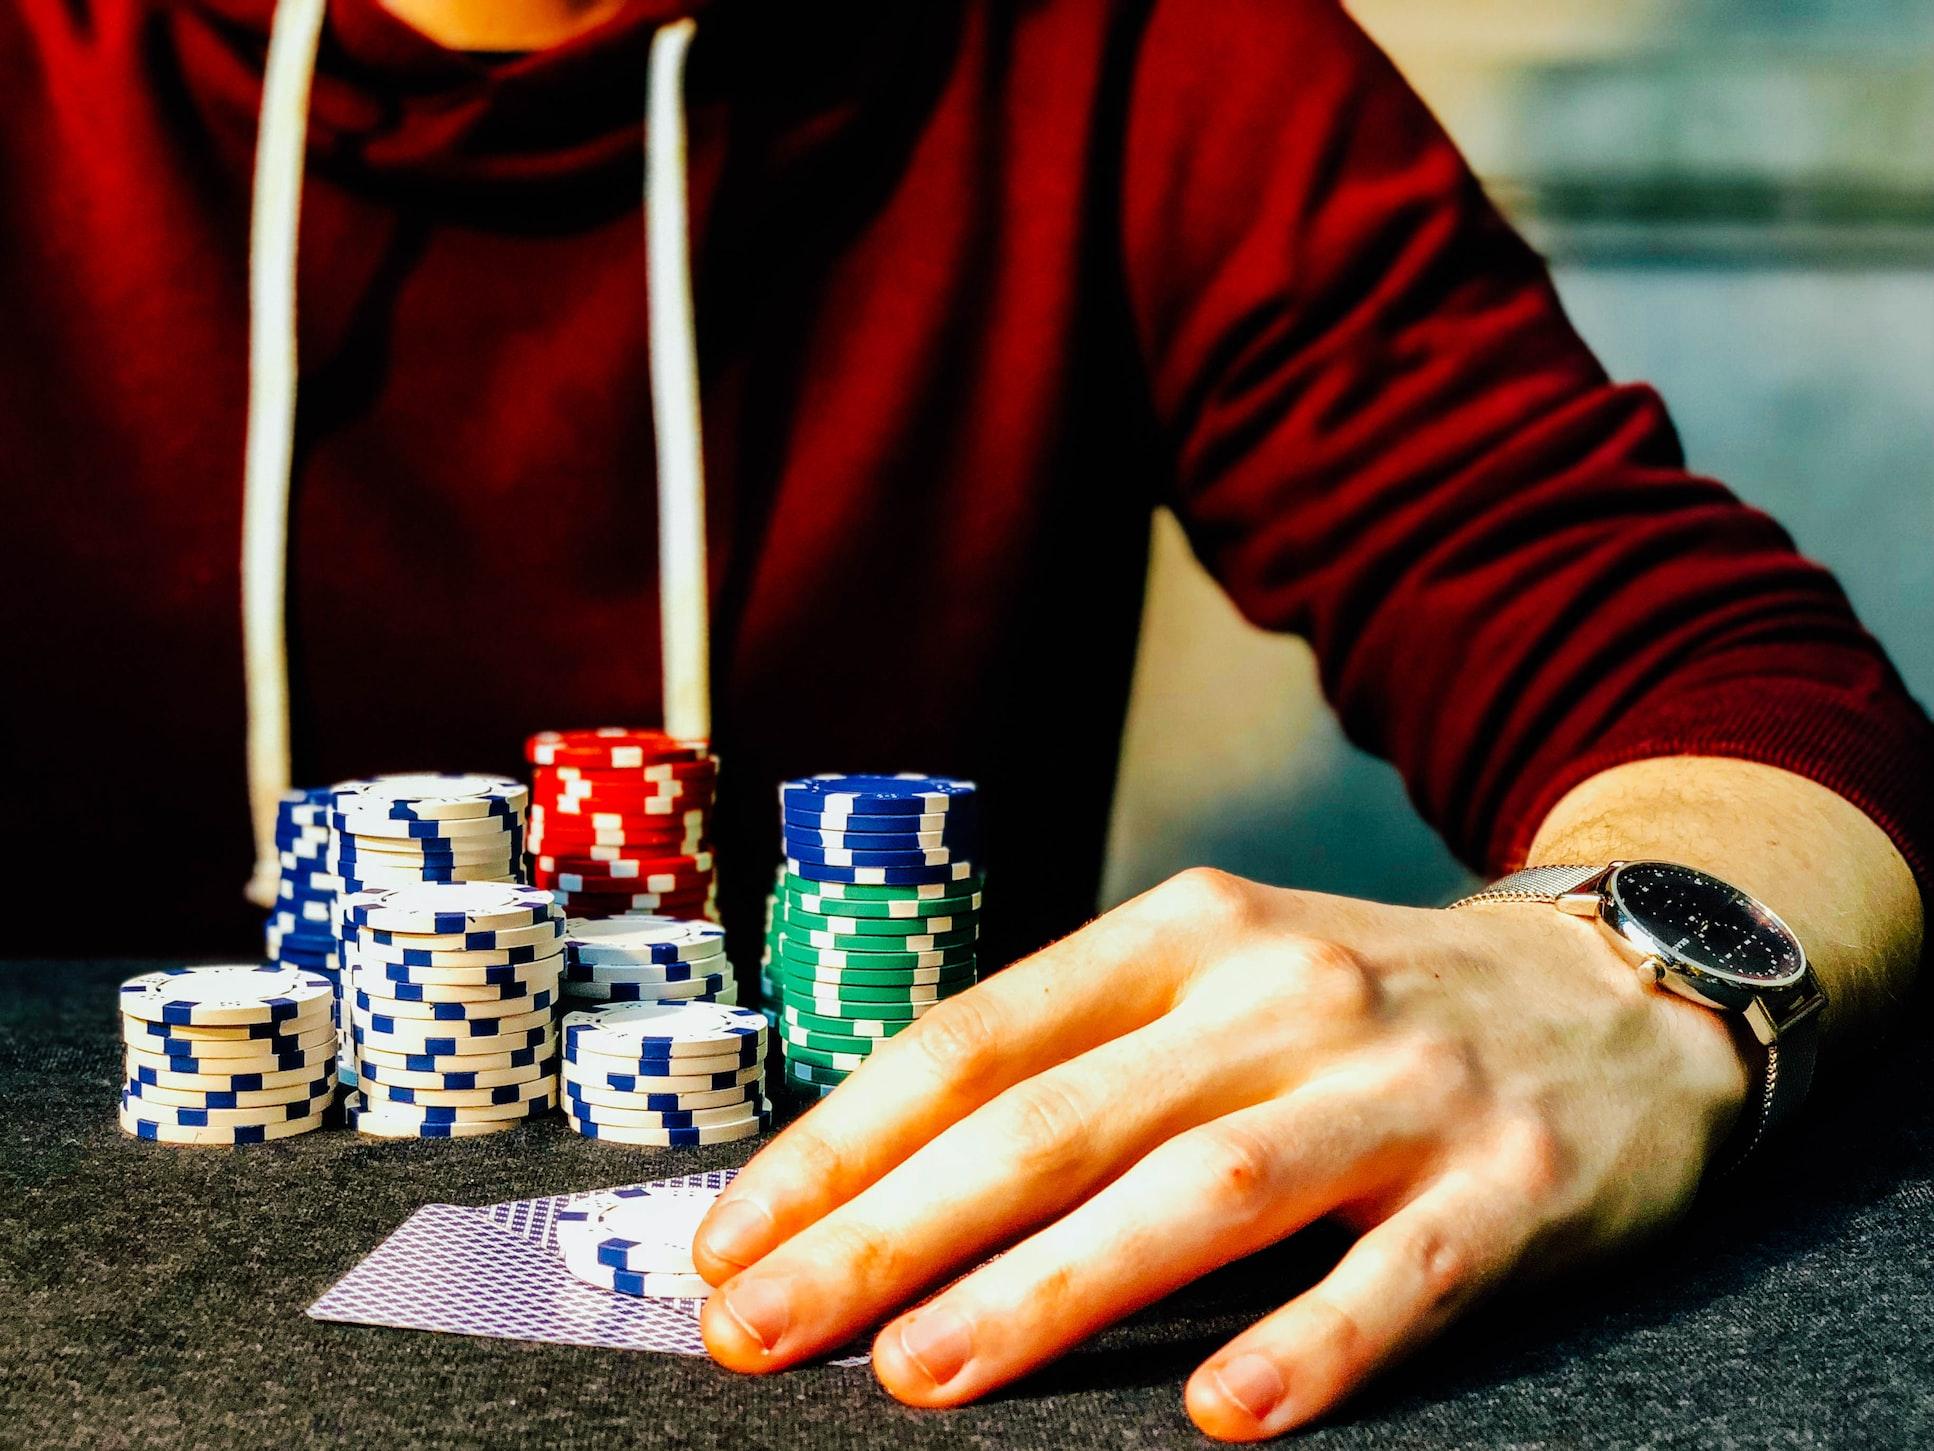 MAN GAMBLES INTO DEBT